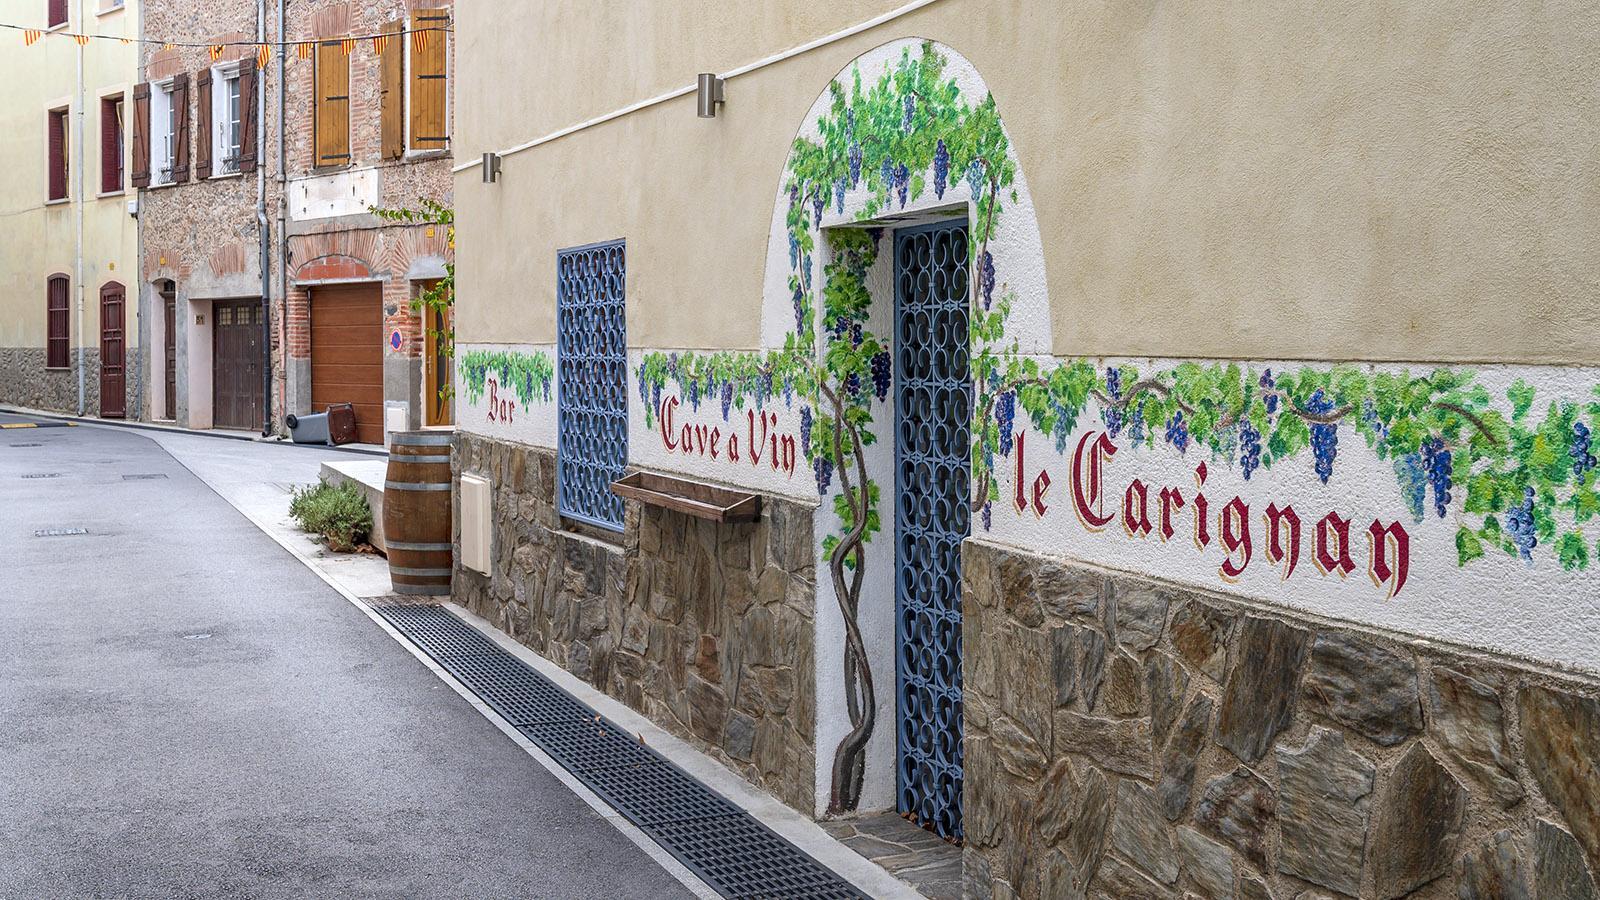 Die Weinbar <em>Le Carignan</em>. Foto: Hilke Maunder